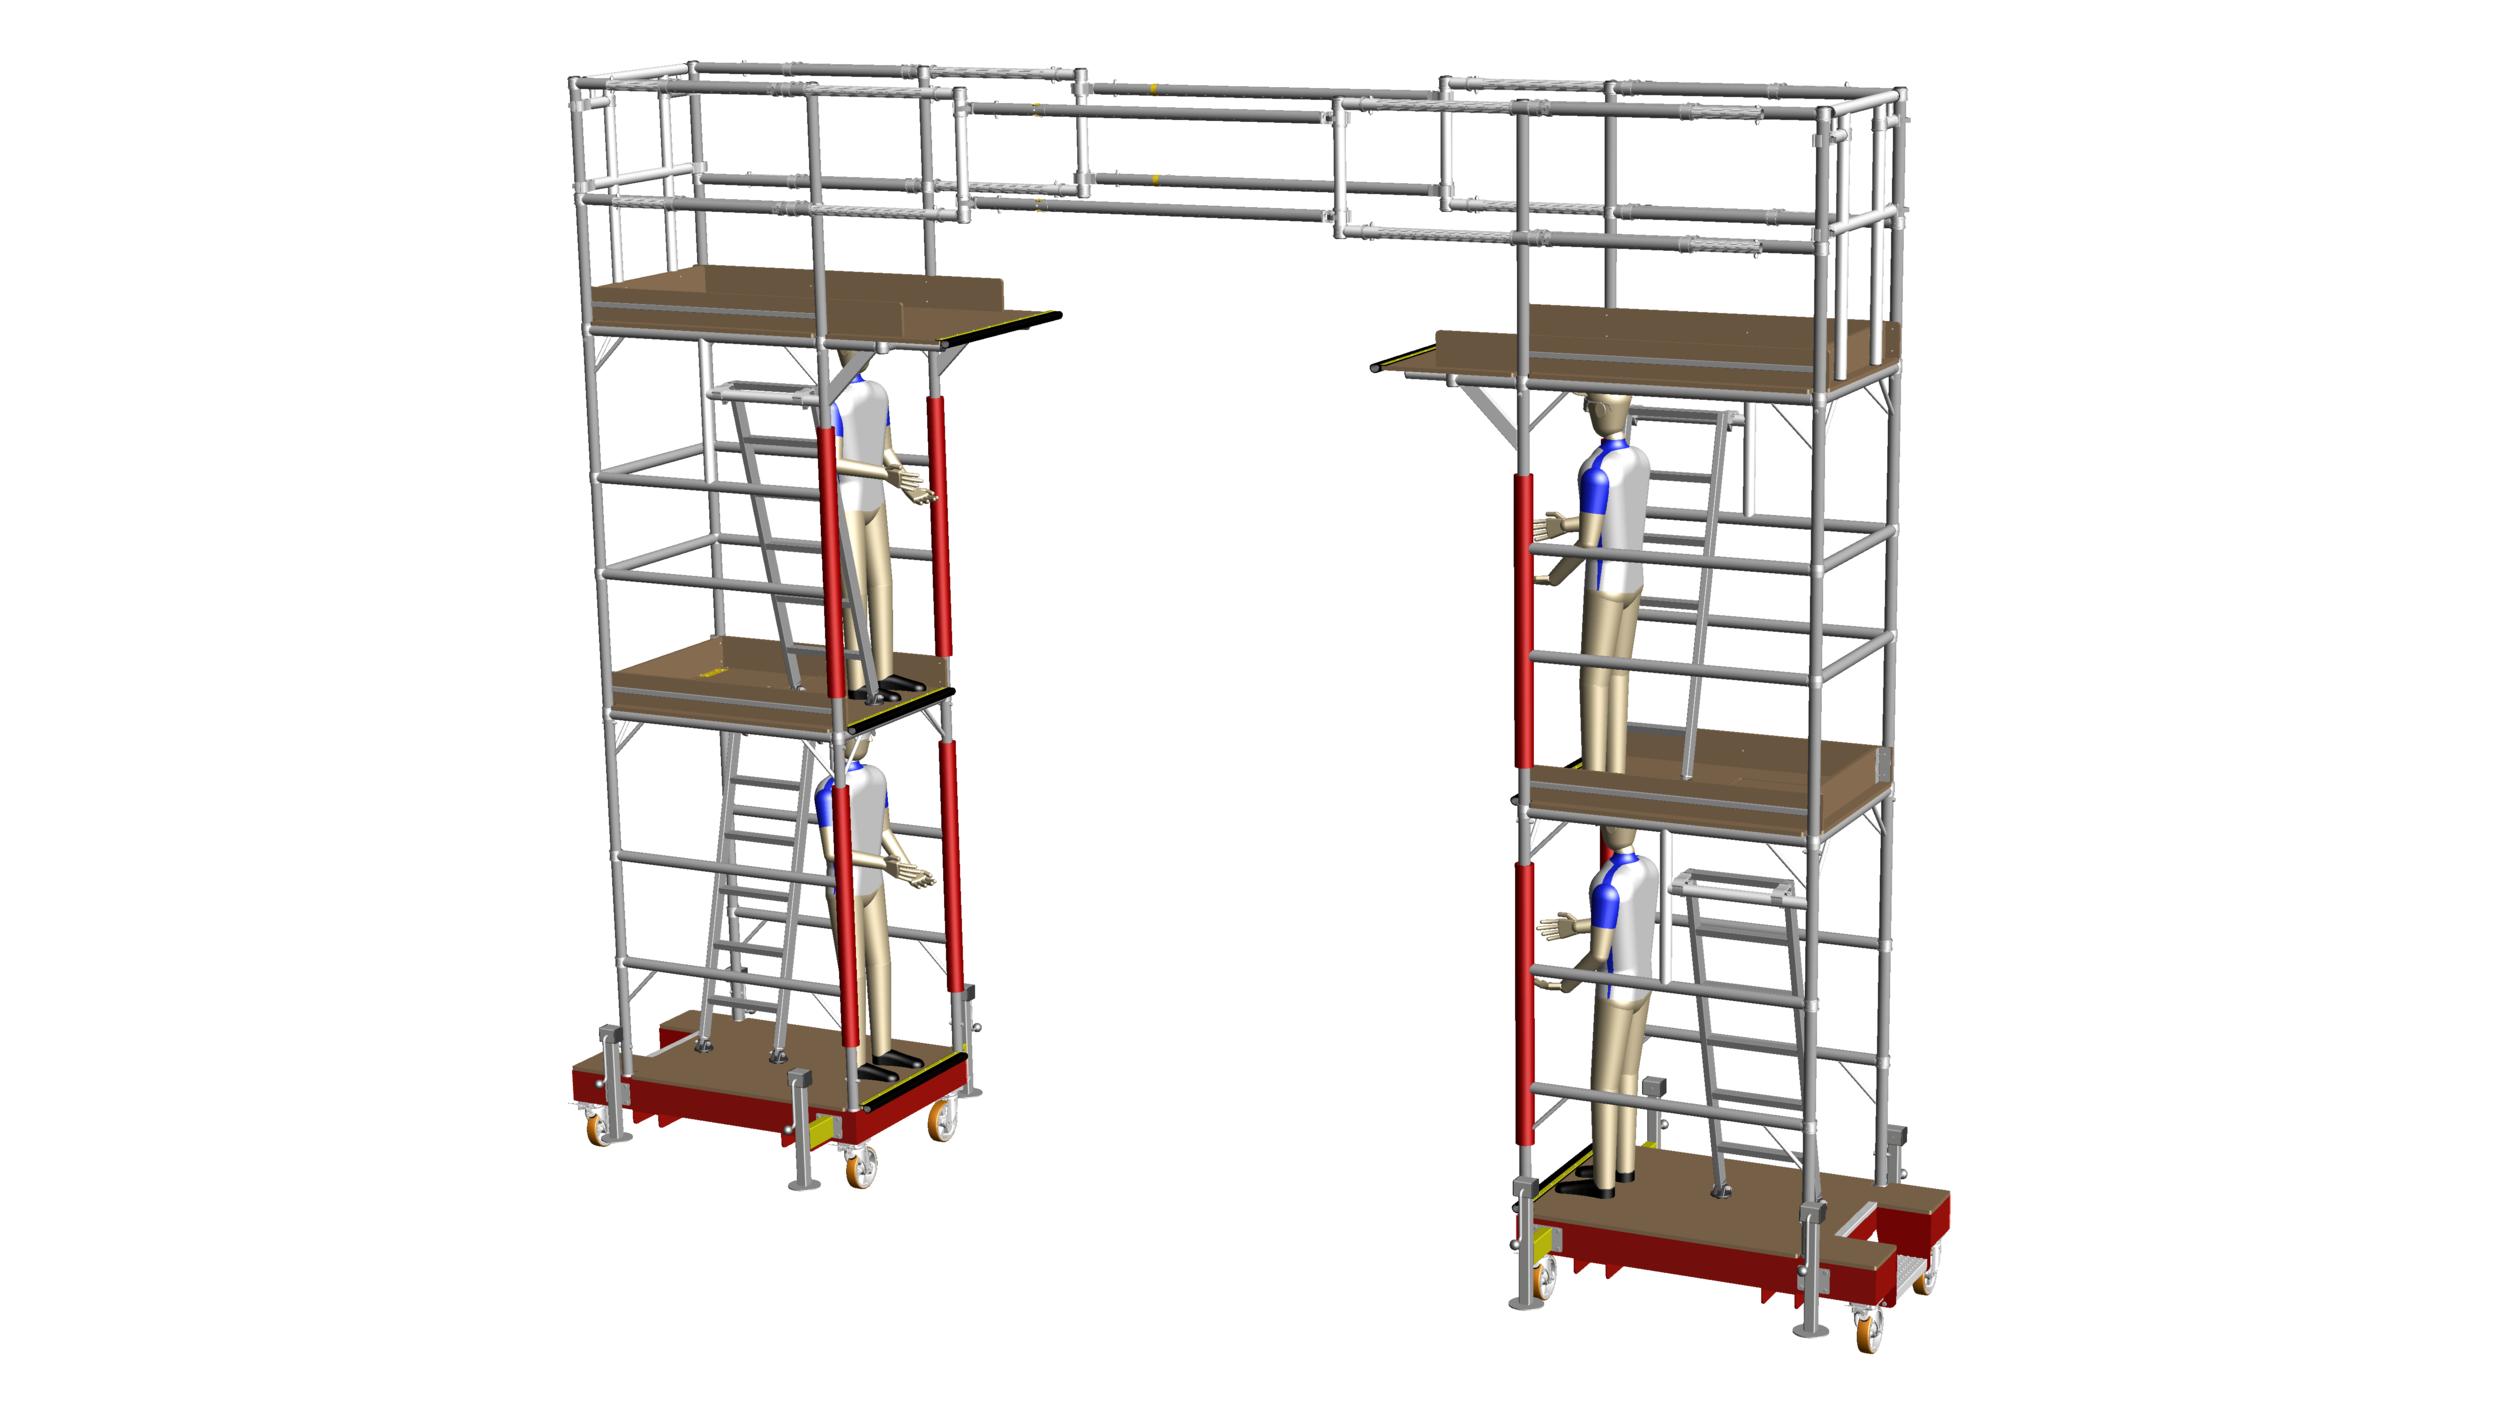 31. Engine fancase linked towers